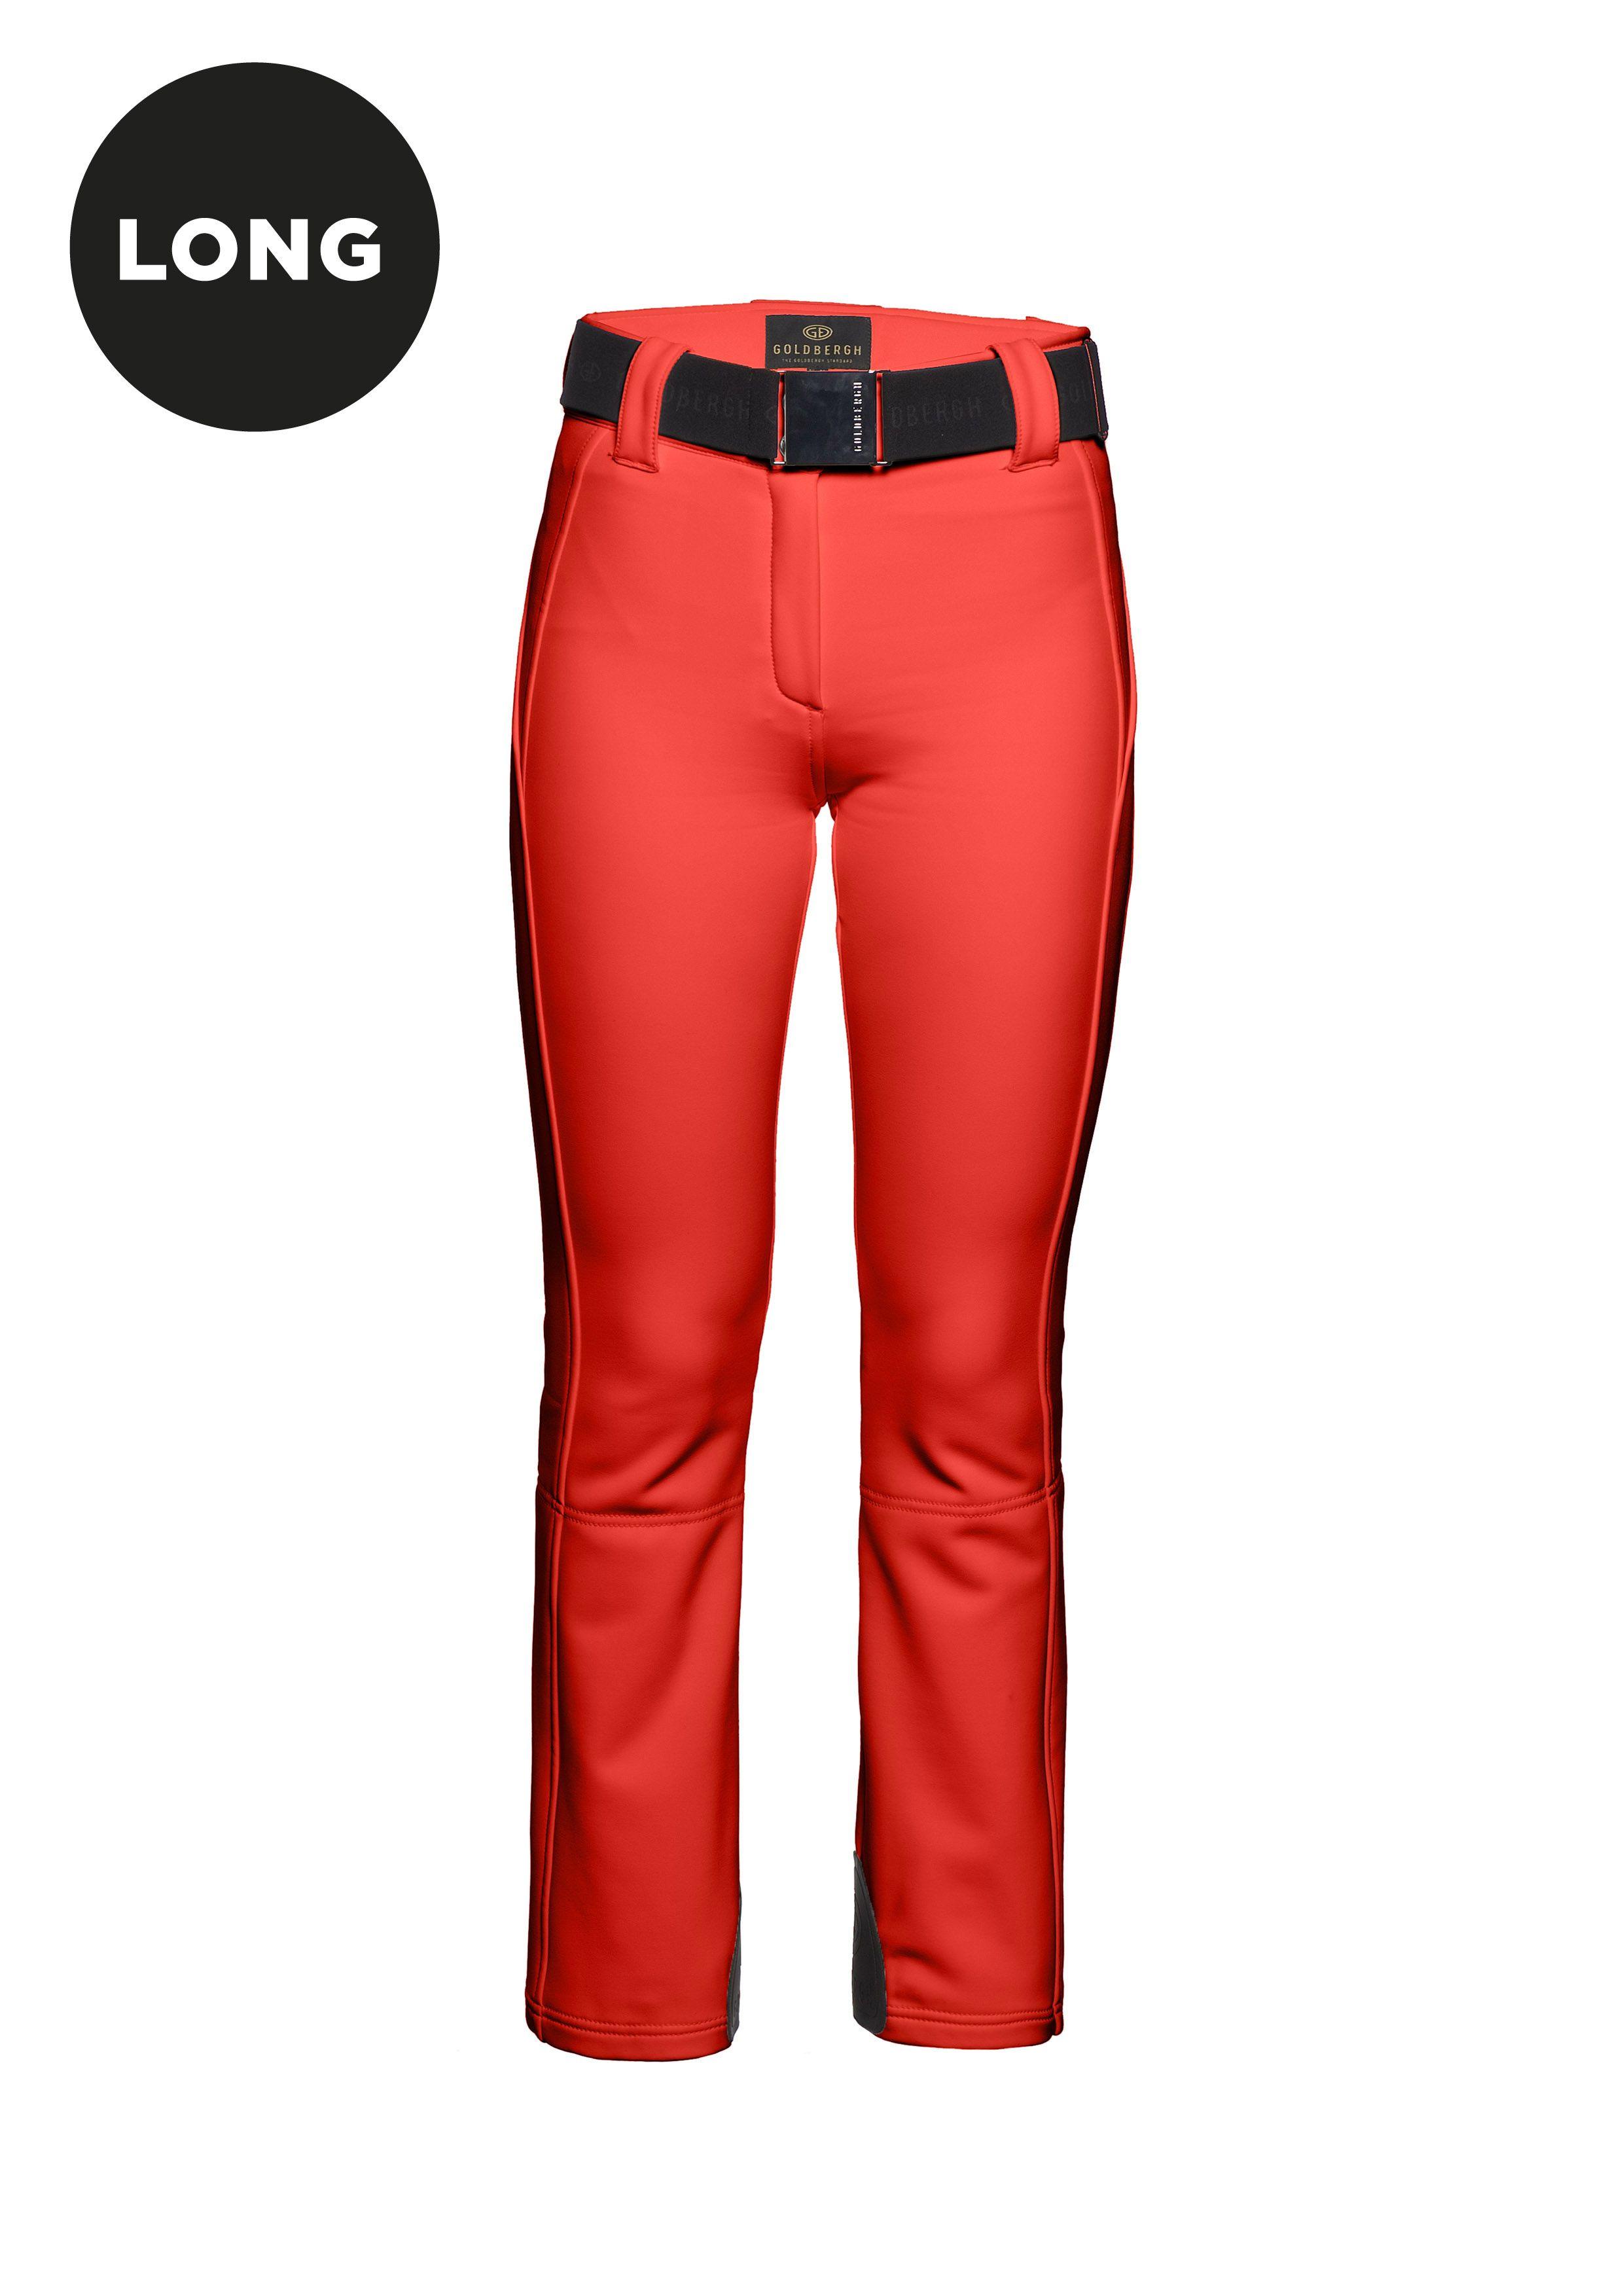 c909d3f75c Pippa GB01-71-173 GB0171173 Red ski pants Fashionable skiwear. luxury  skiwear For tall women. 4 way stretch. 3 layer. softshell.